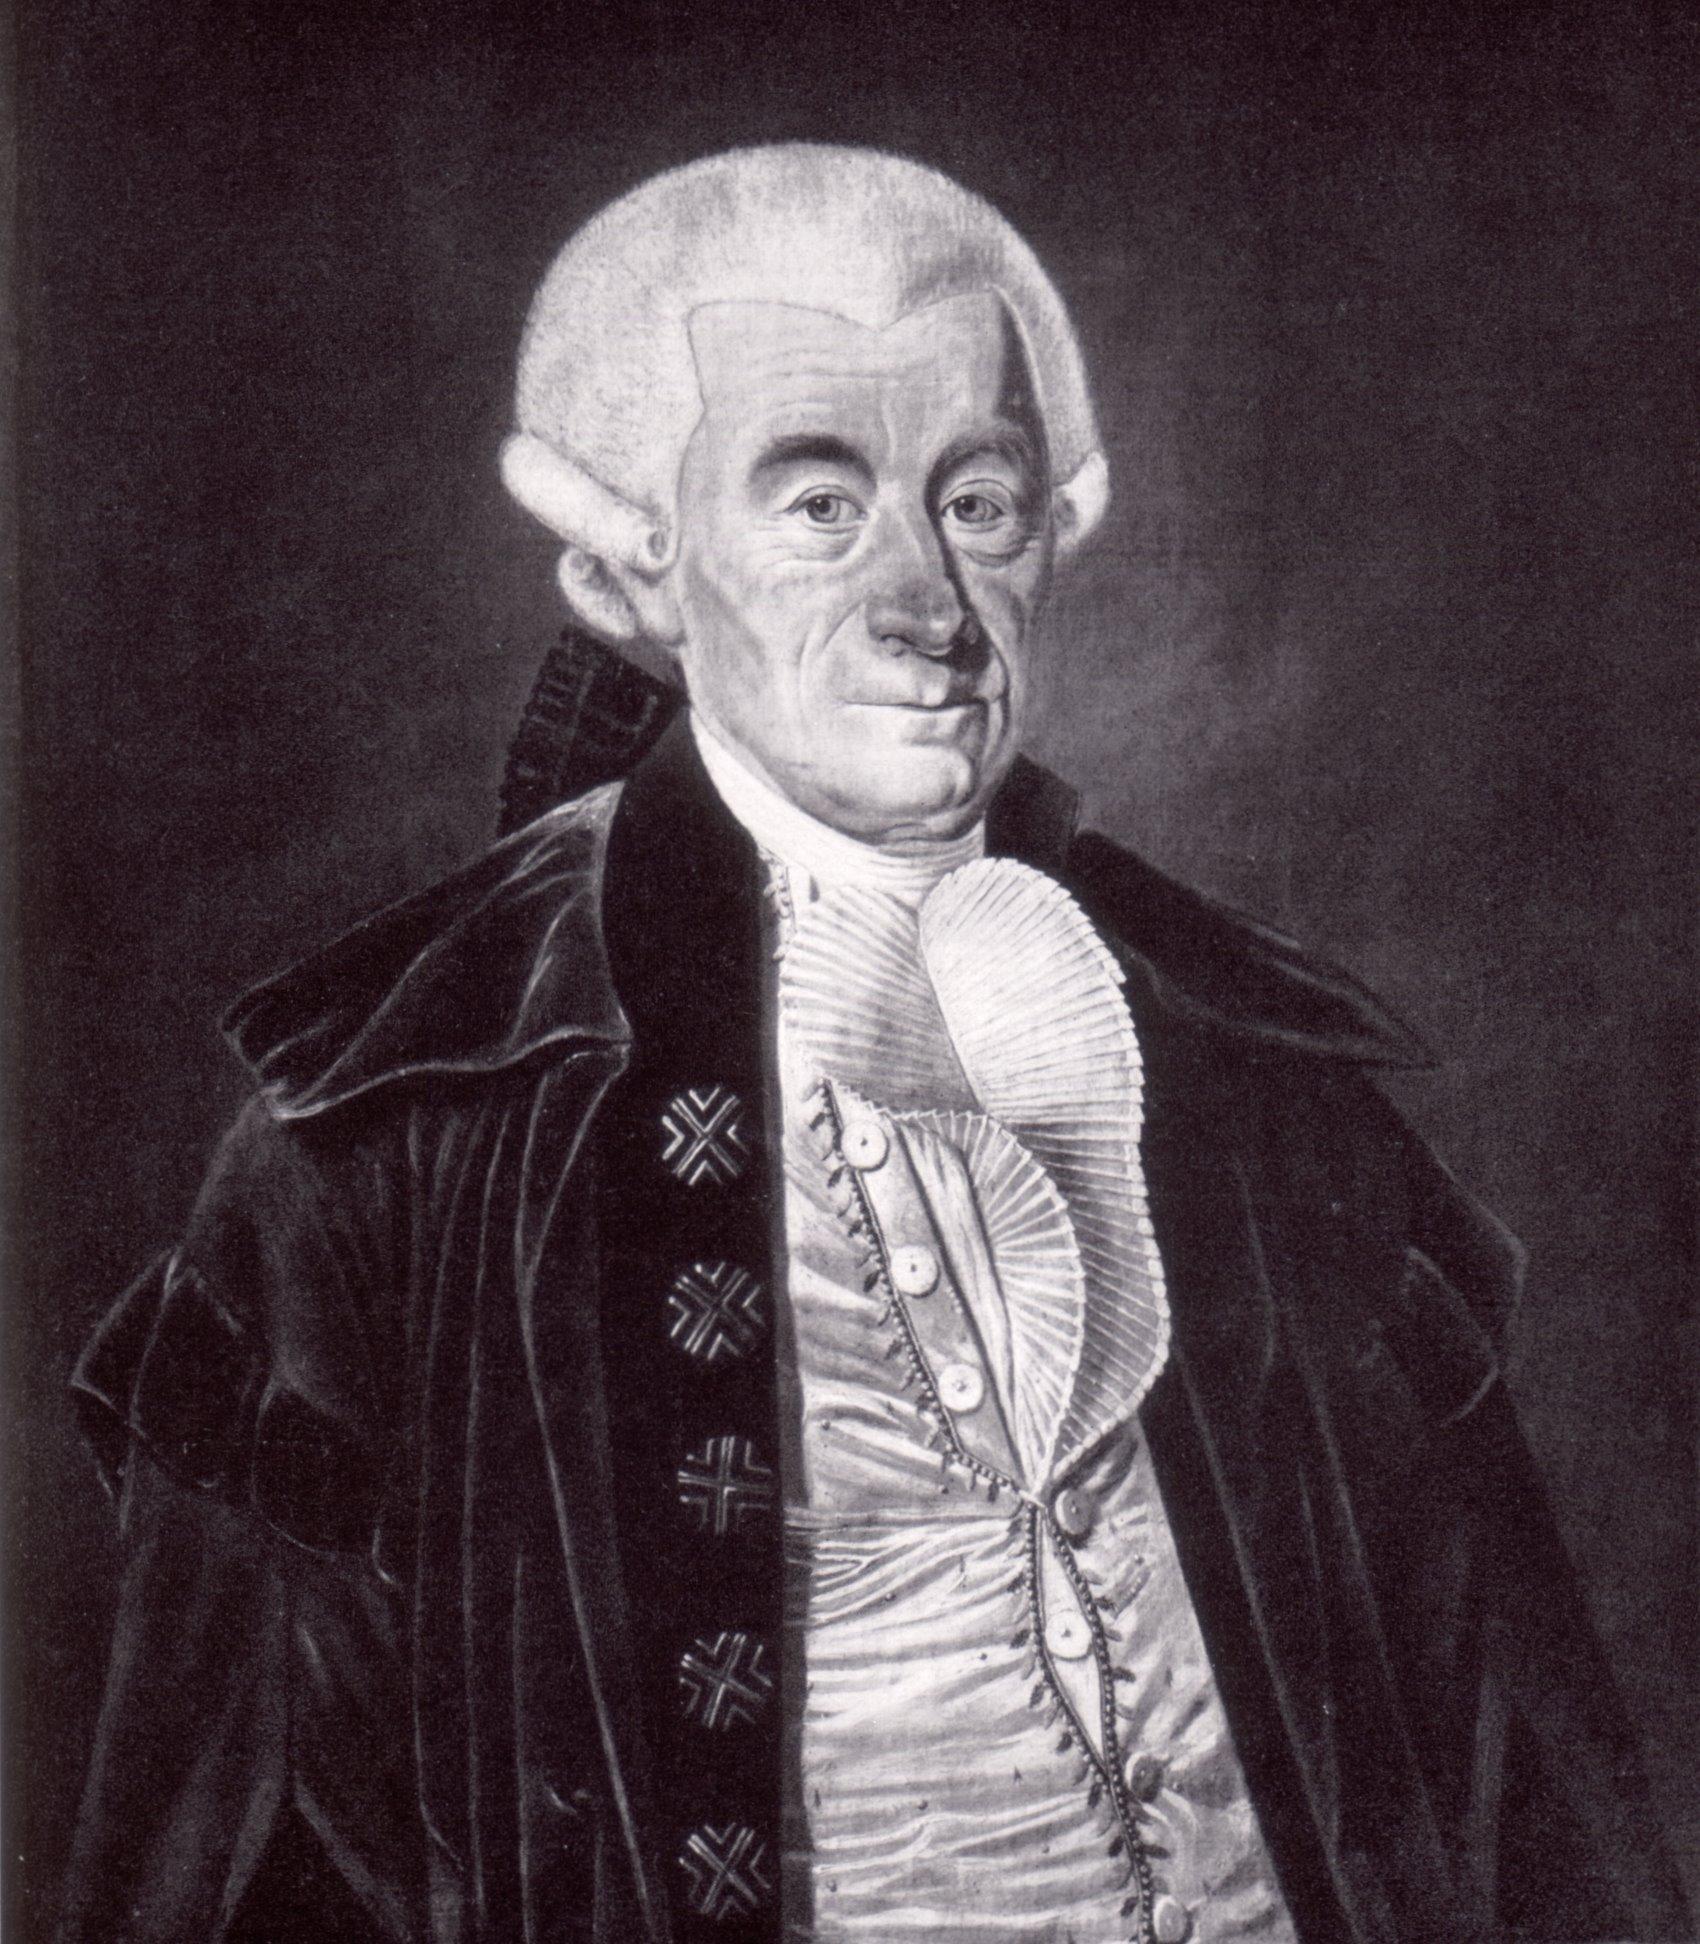 Portrait of Johann Stephan Pütter by CarlLafontaine